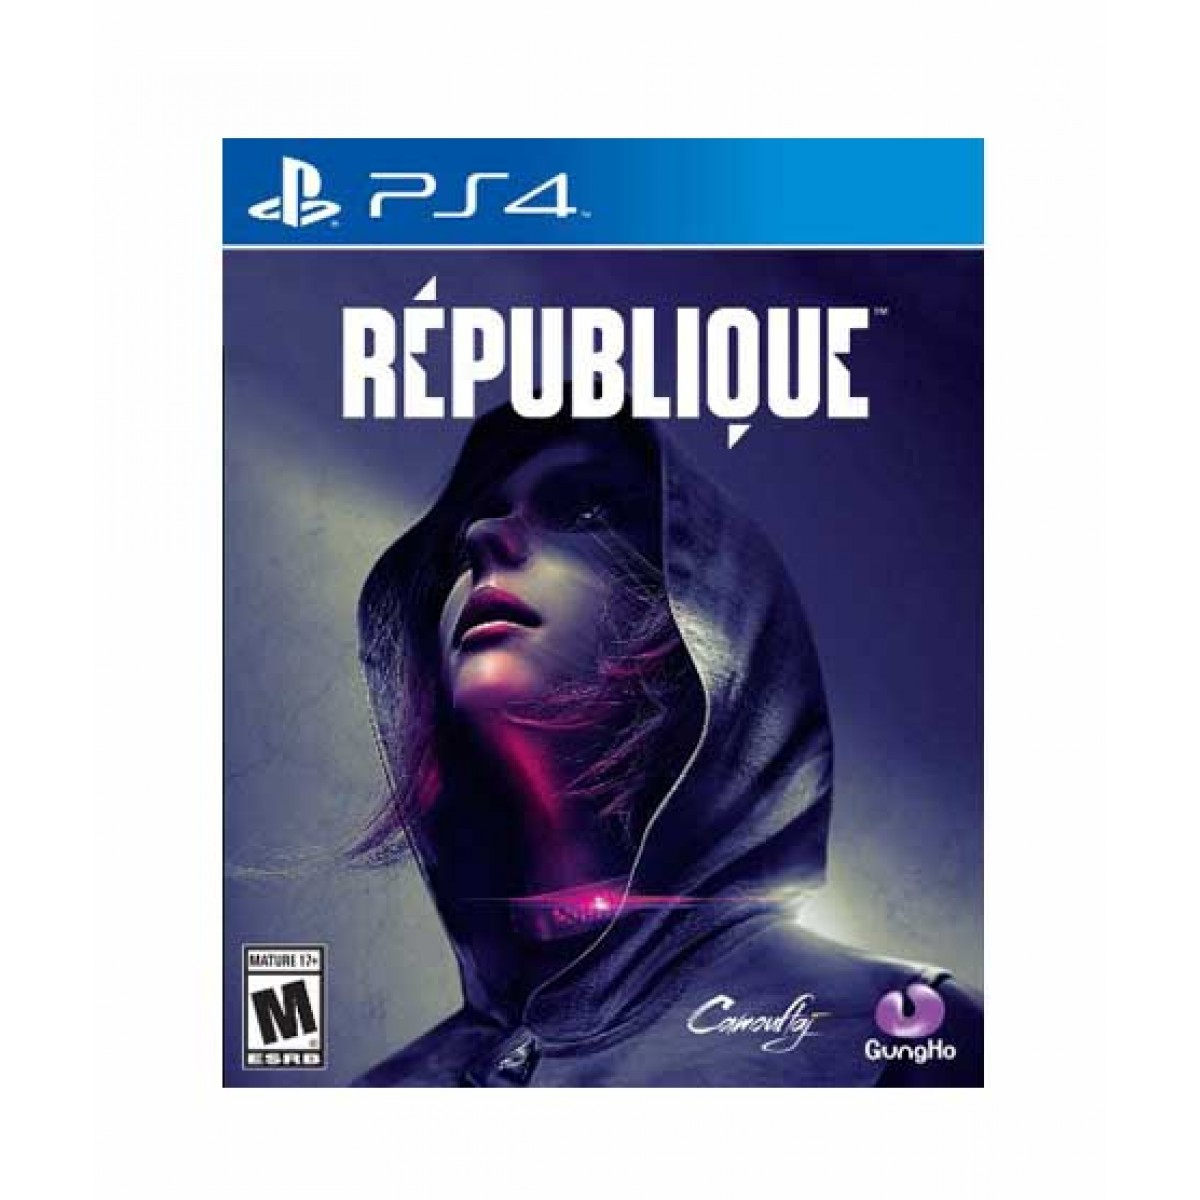 Republique Game For PS4